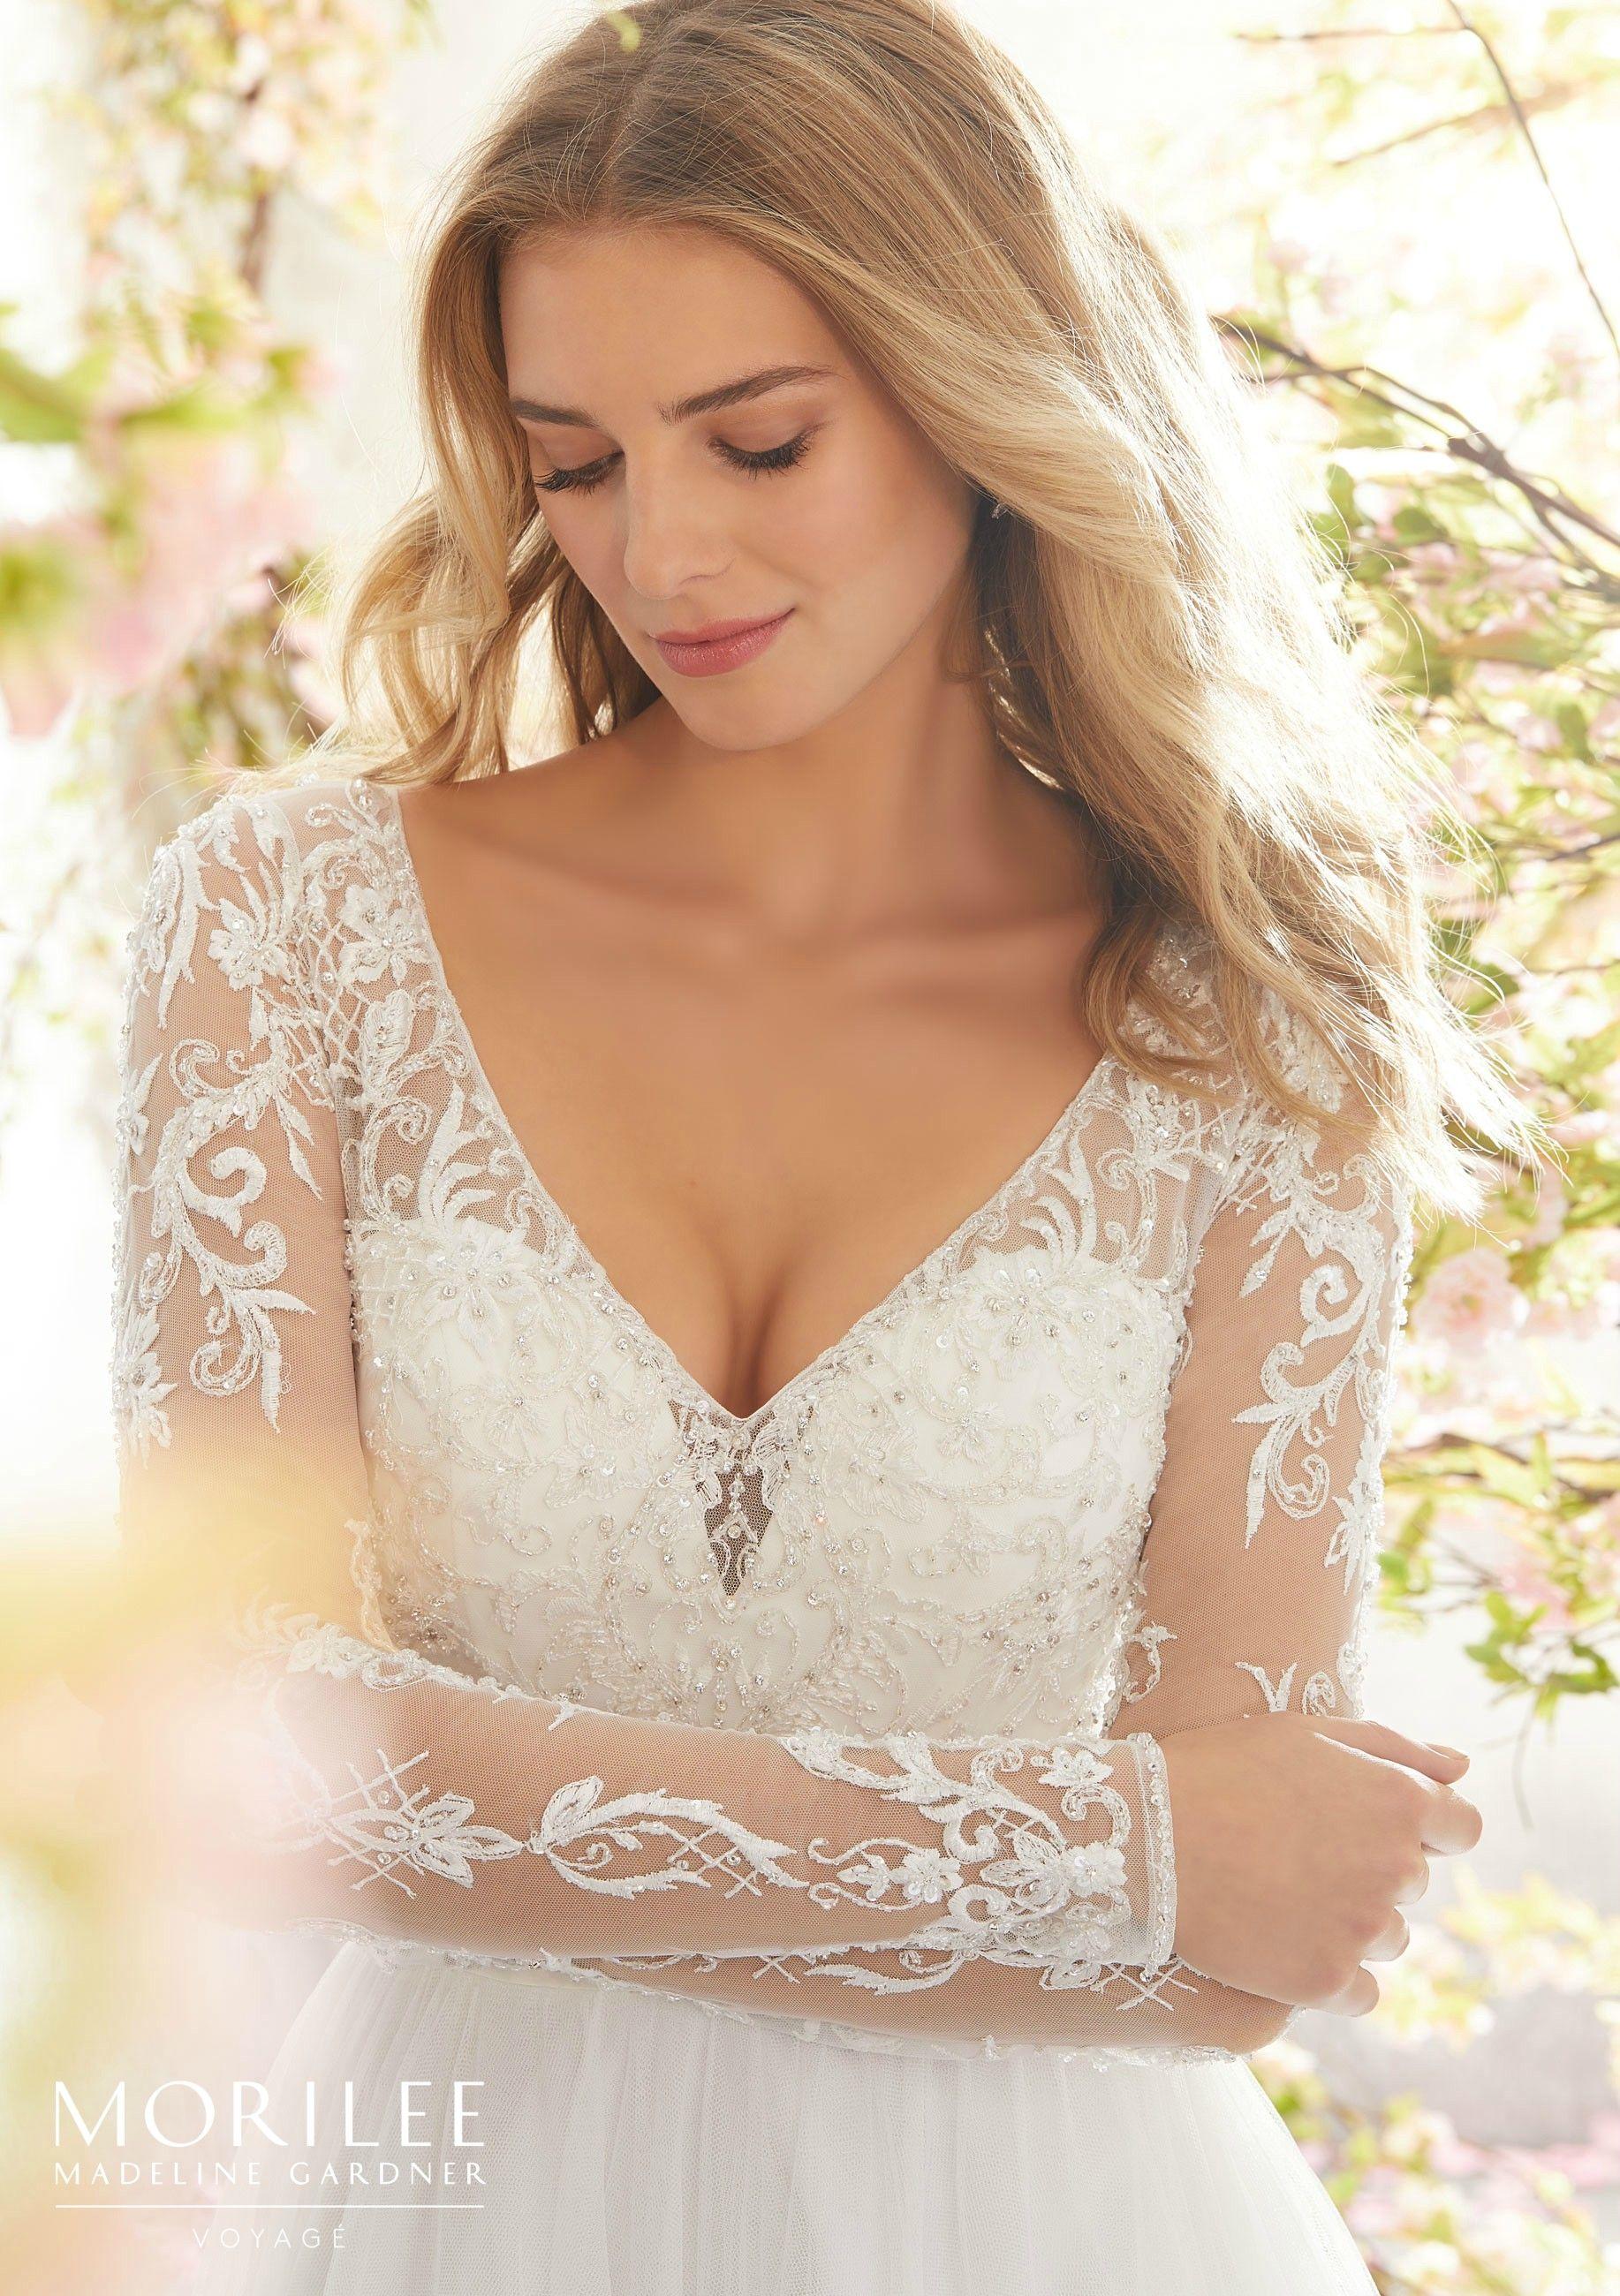 Mori lee madeline gardner wedding dress  Leanne Wedding Dress  Wedding photographers  Pinterest